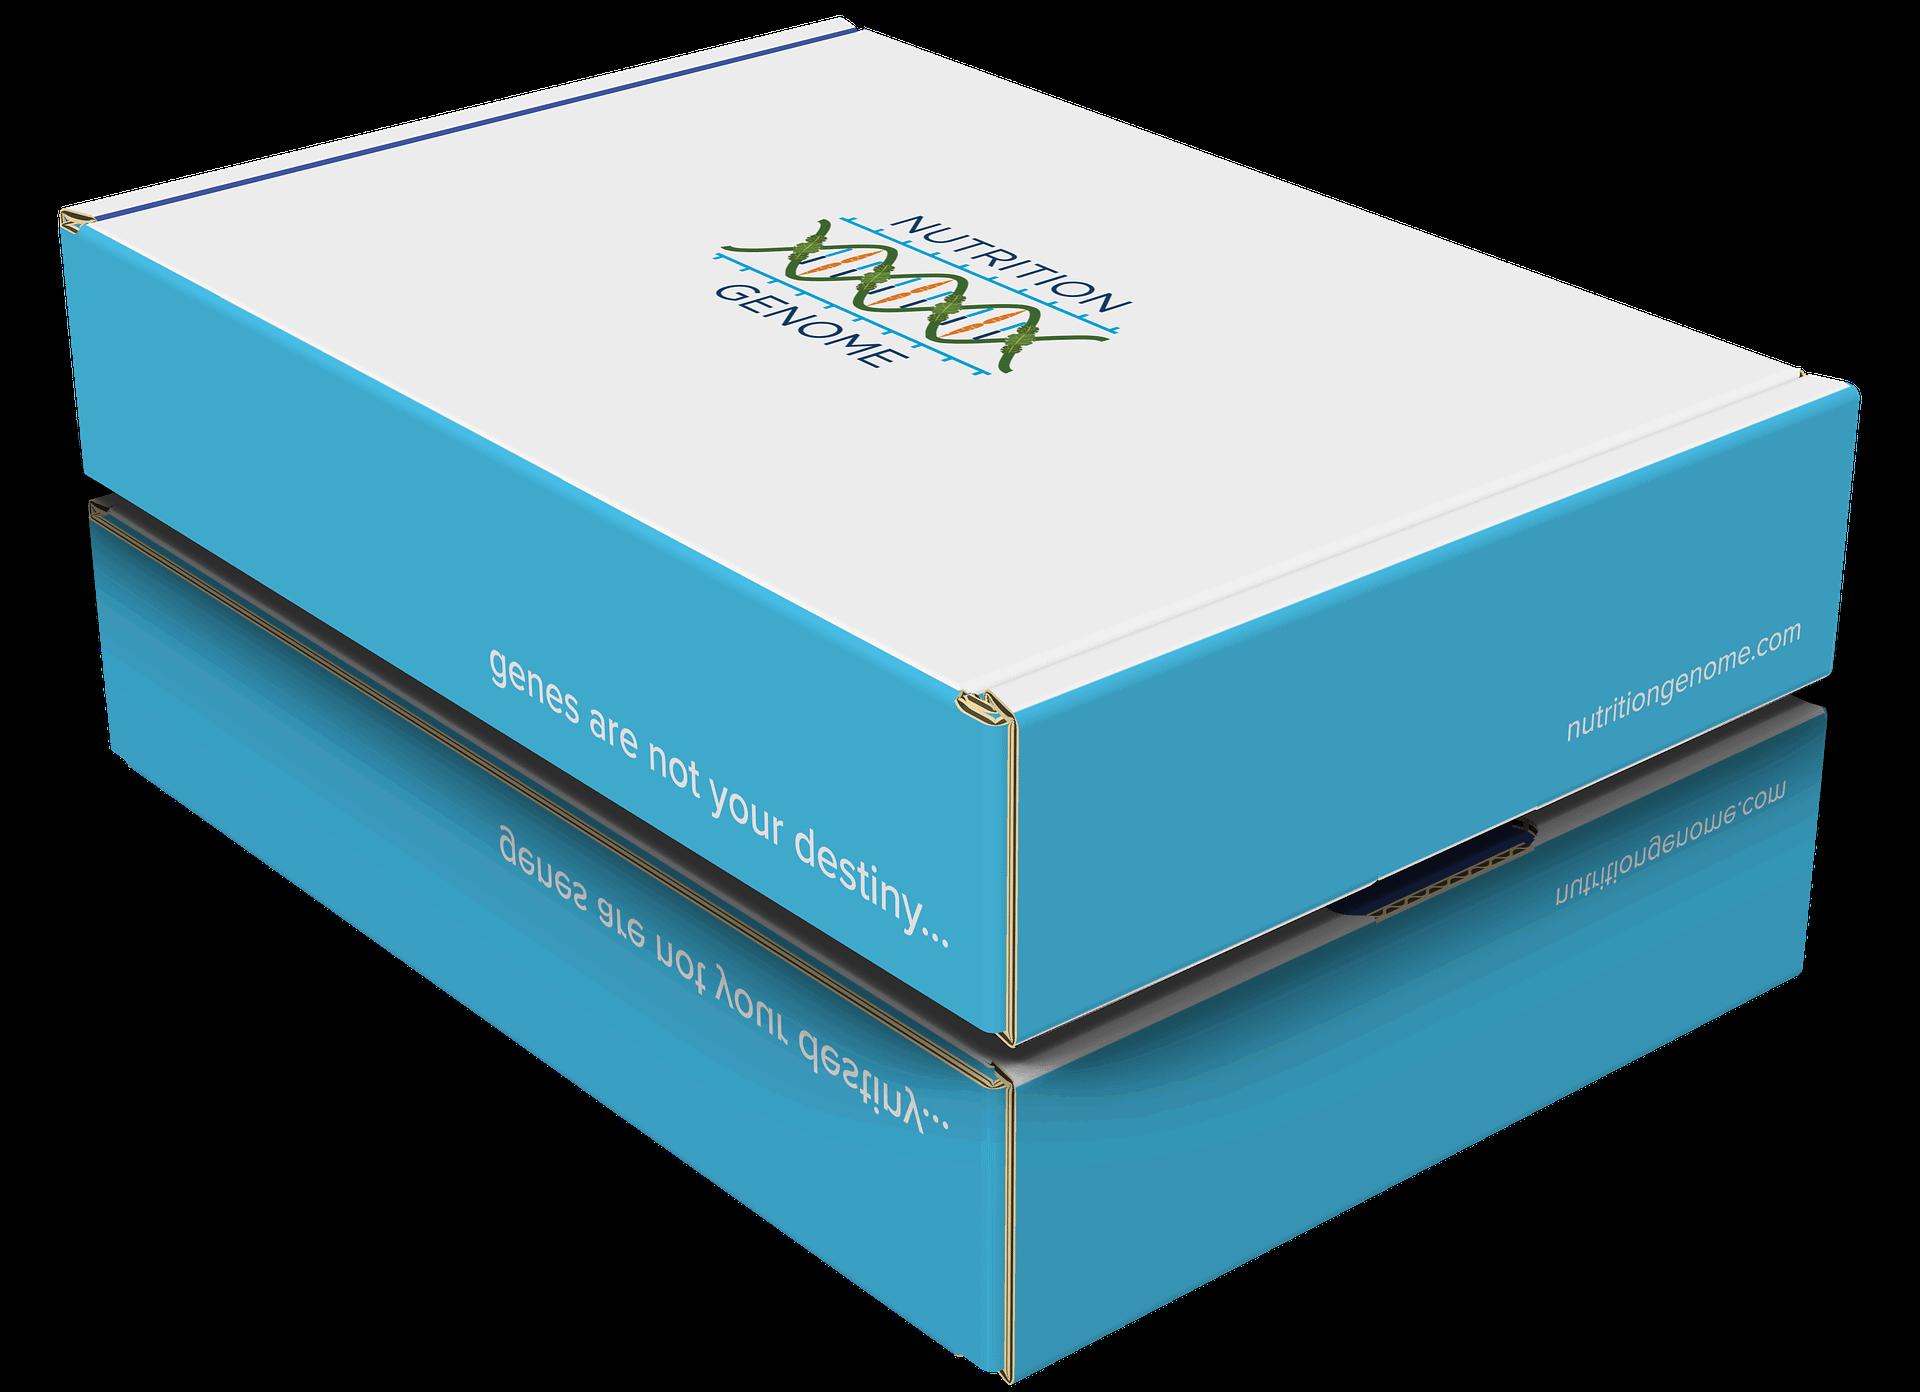 dna nutrition testing  1 Nutrition Genome RETT Render Closed Persp 11 20 2017 e1508882723883